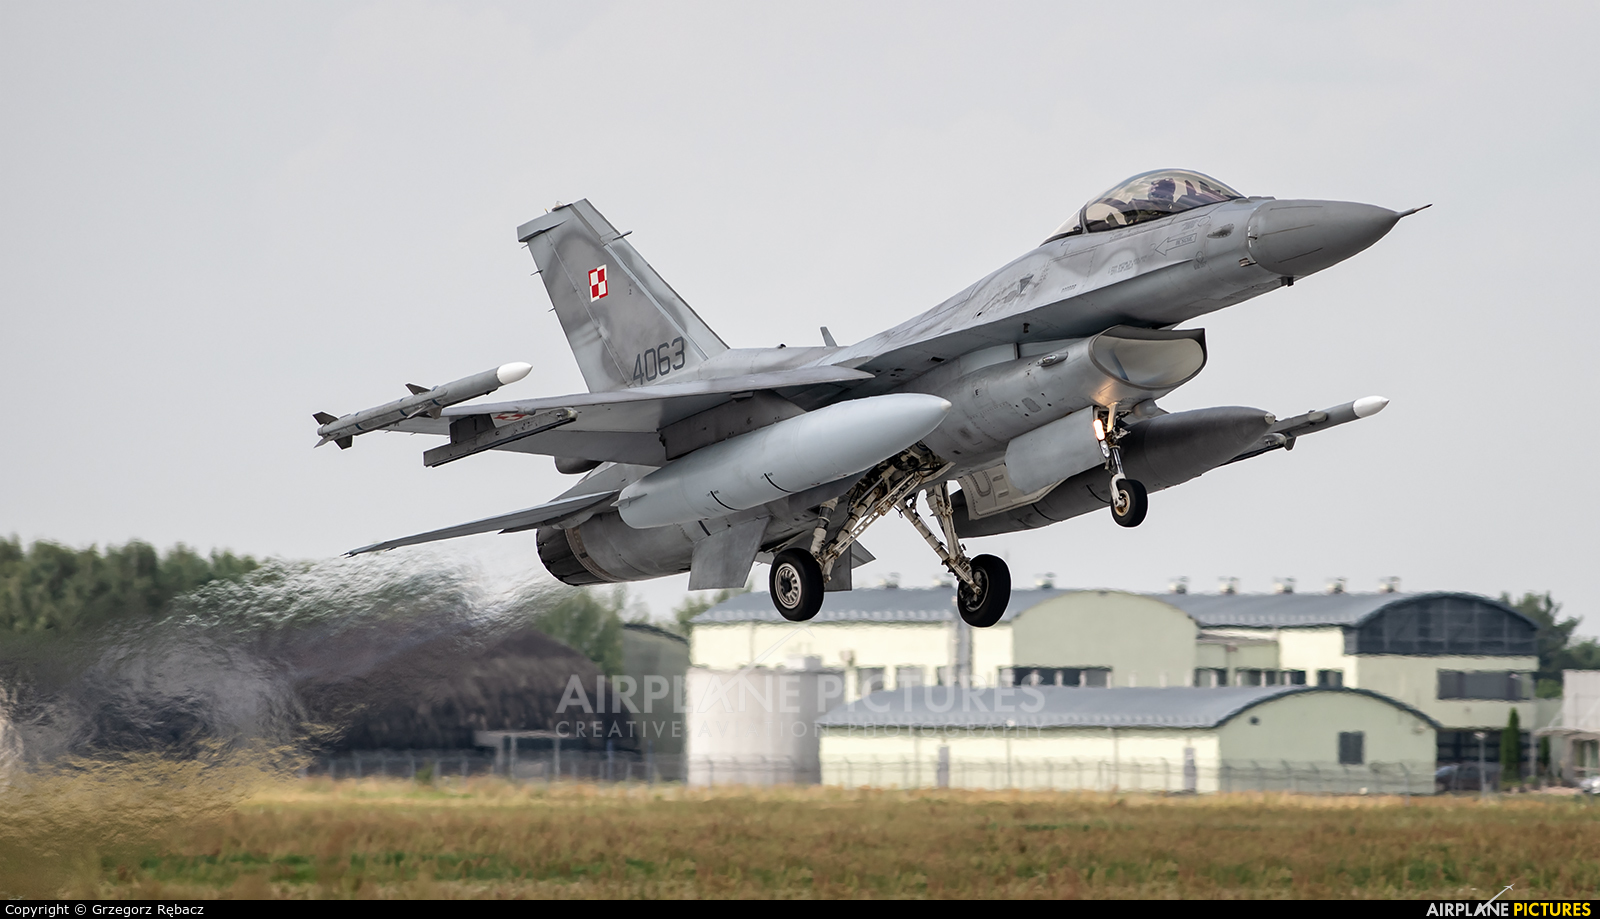 Poland - Air Force 4063 aircraft at Łask AB